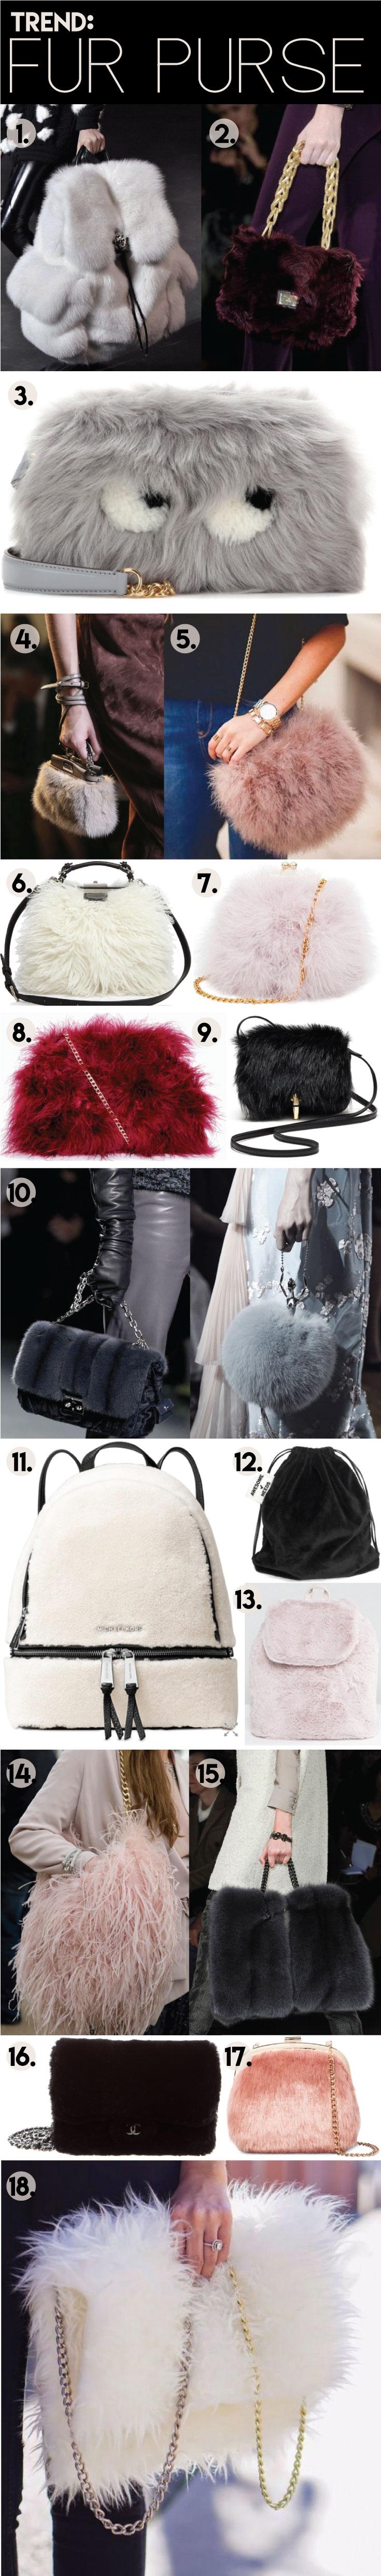 Fur_Purse_Trend.jpg